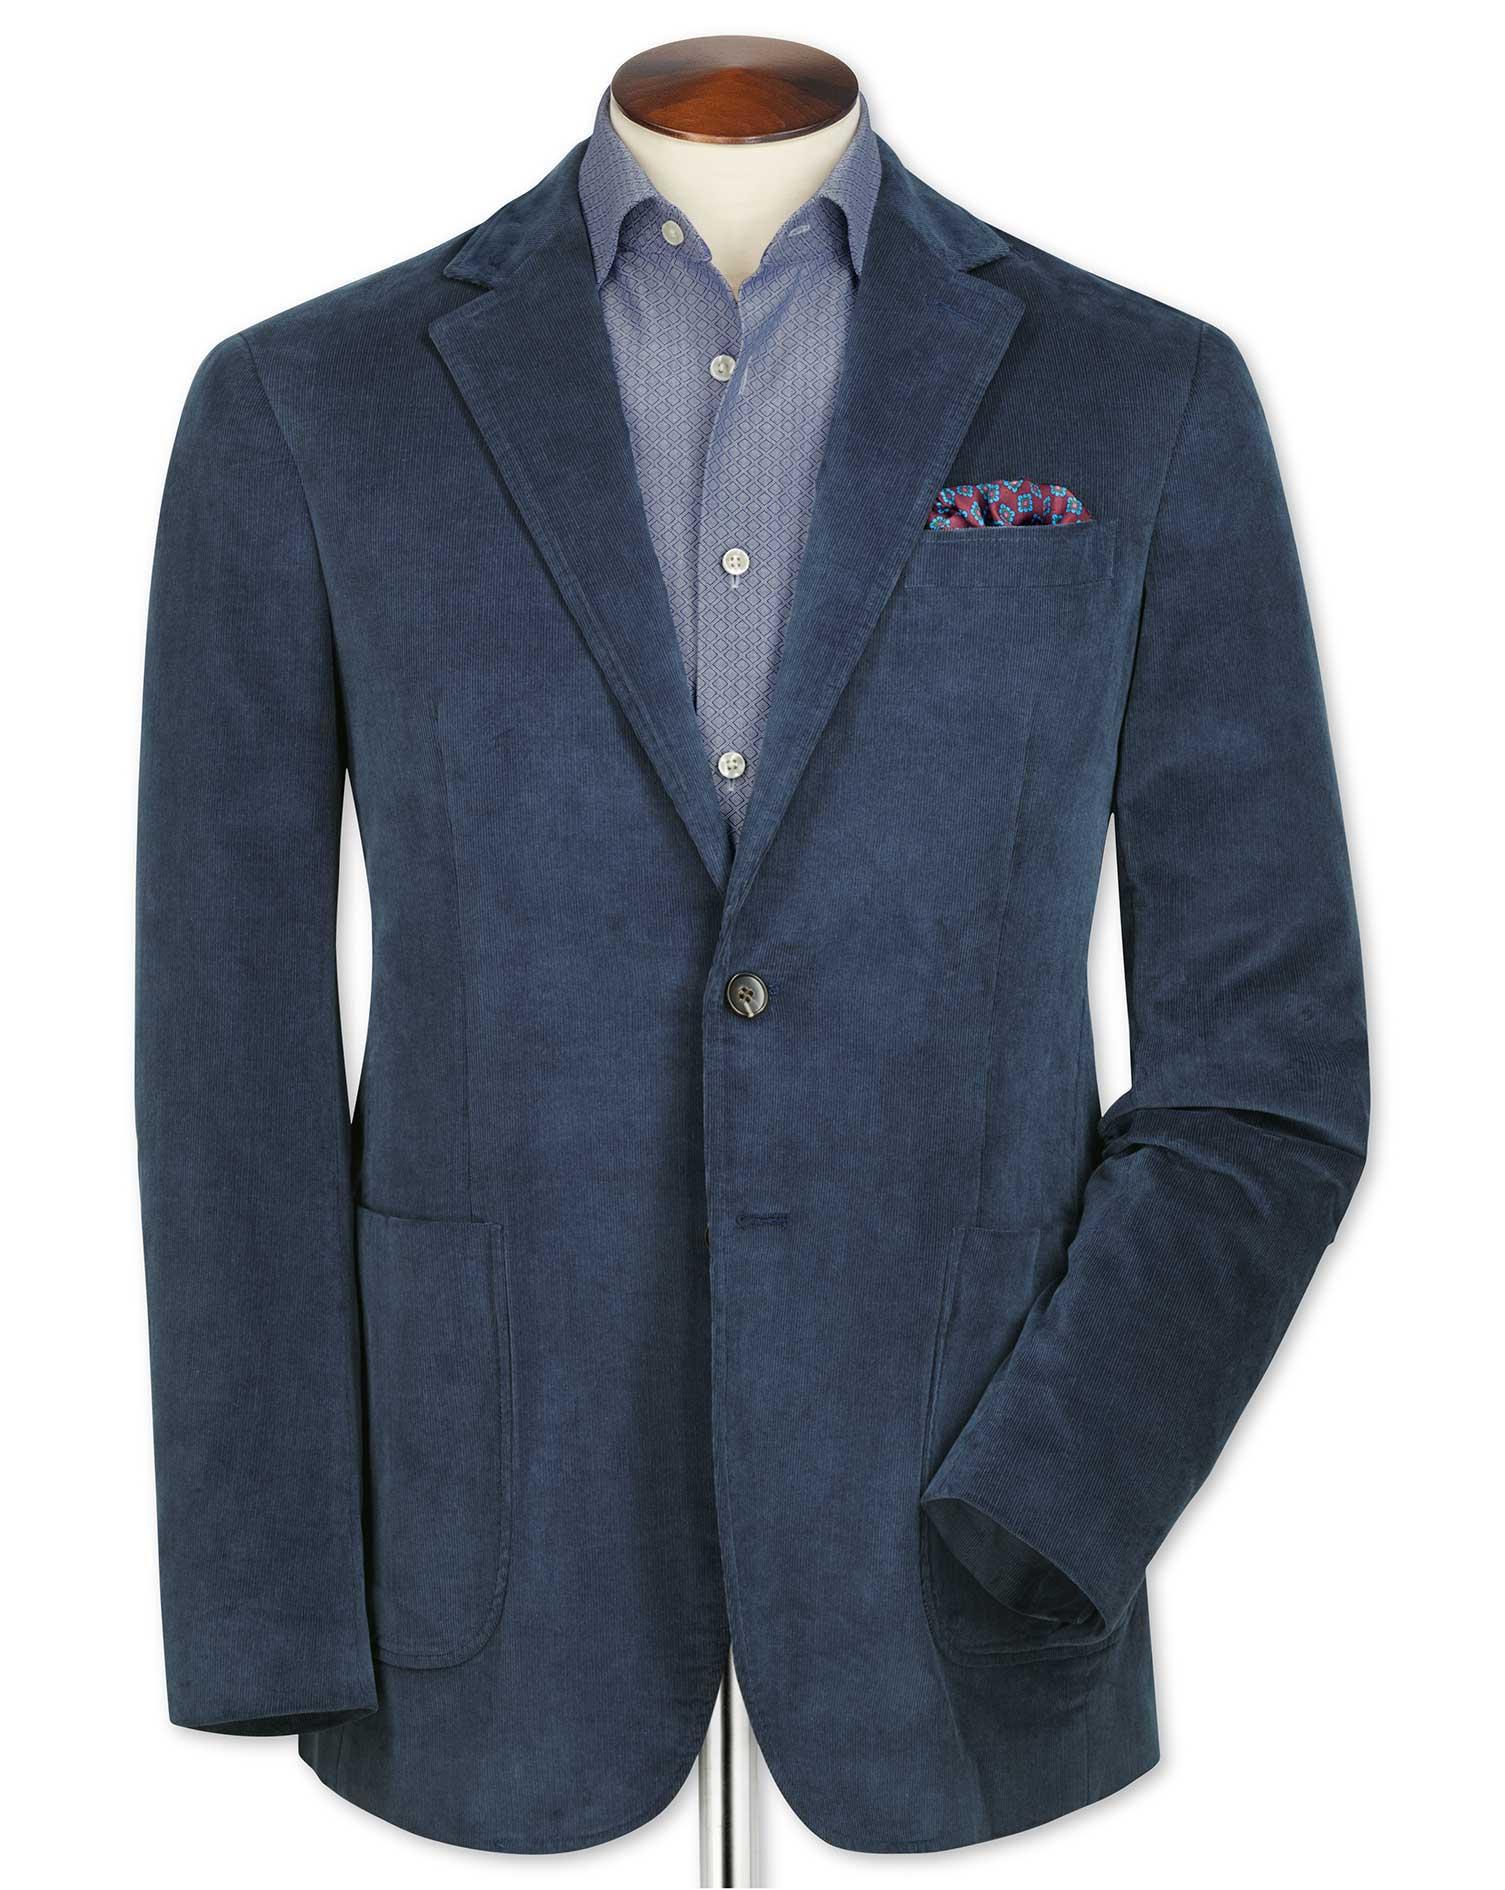 Slim Fit Blue Stretch Cord Cotton Jacket Size 38 Regular by Charles Tyrwhitt